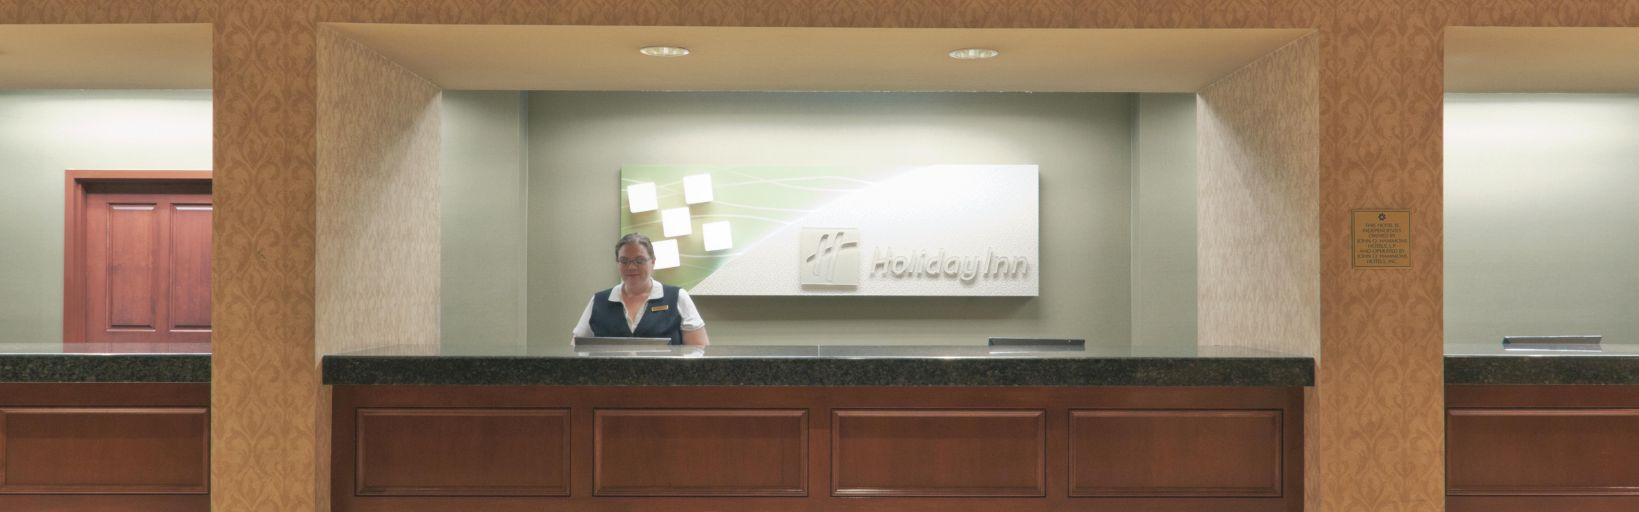 7 Days Inn Hefei Mingguang Road Bus Station Branch Holiday Inn Sacramento Capitol Plaza Hotel By Ihg